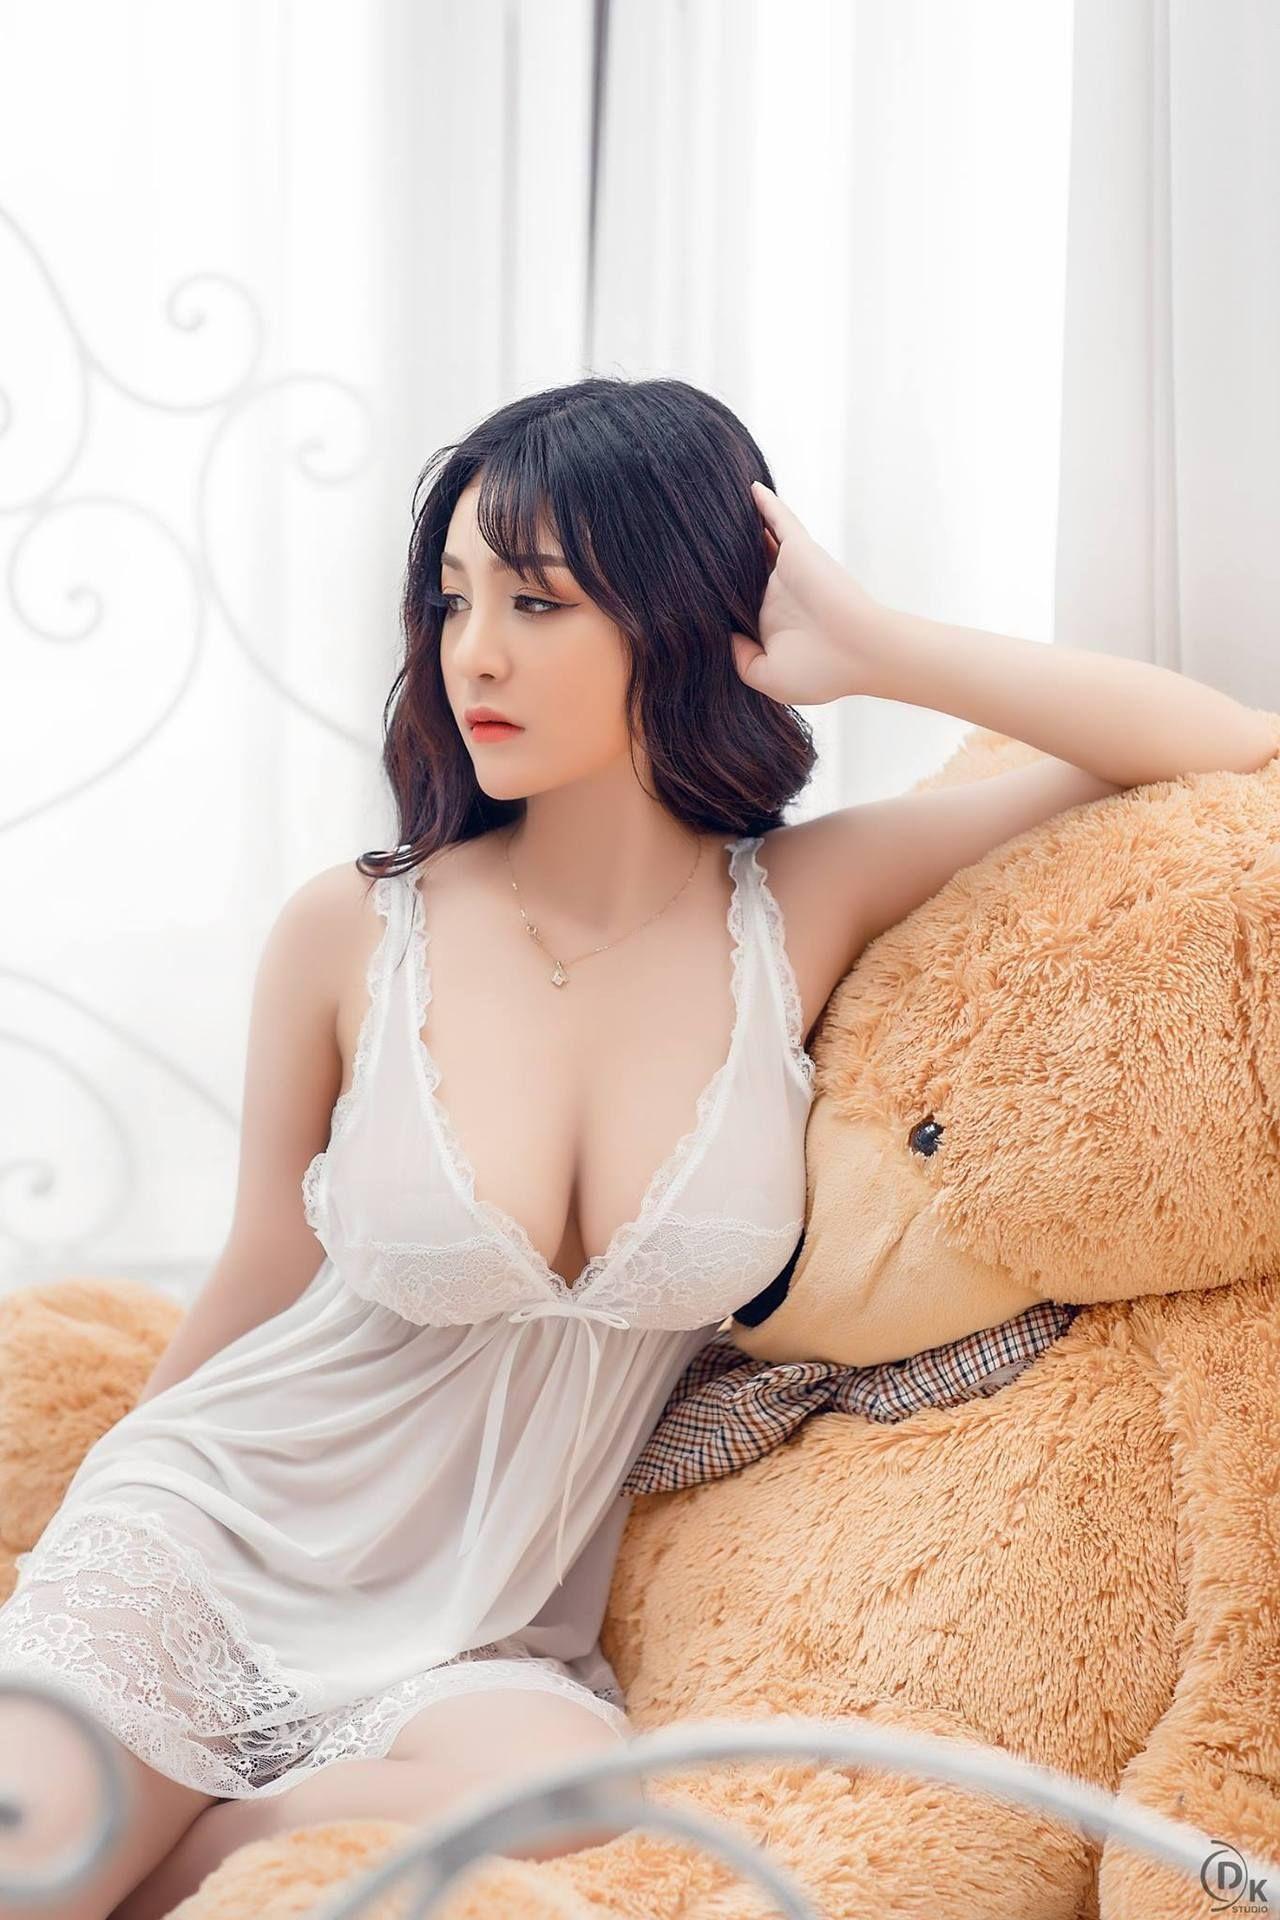 Photo Femme asiatique photos xxx